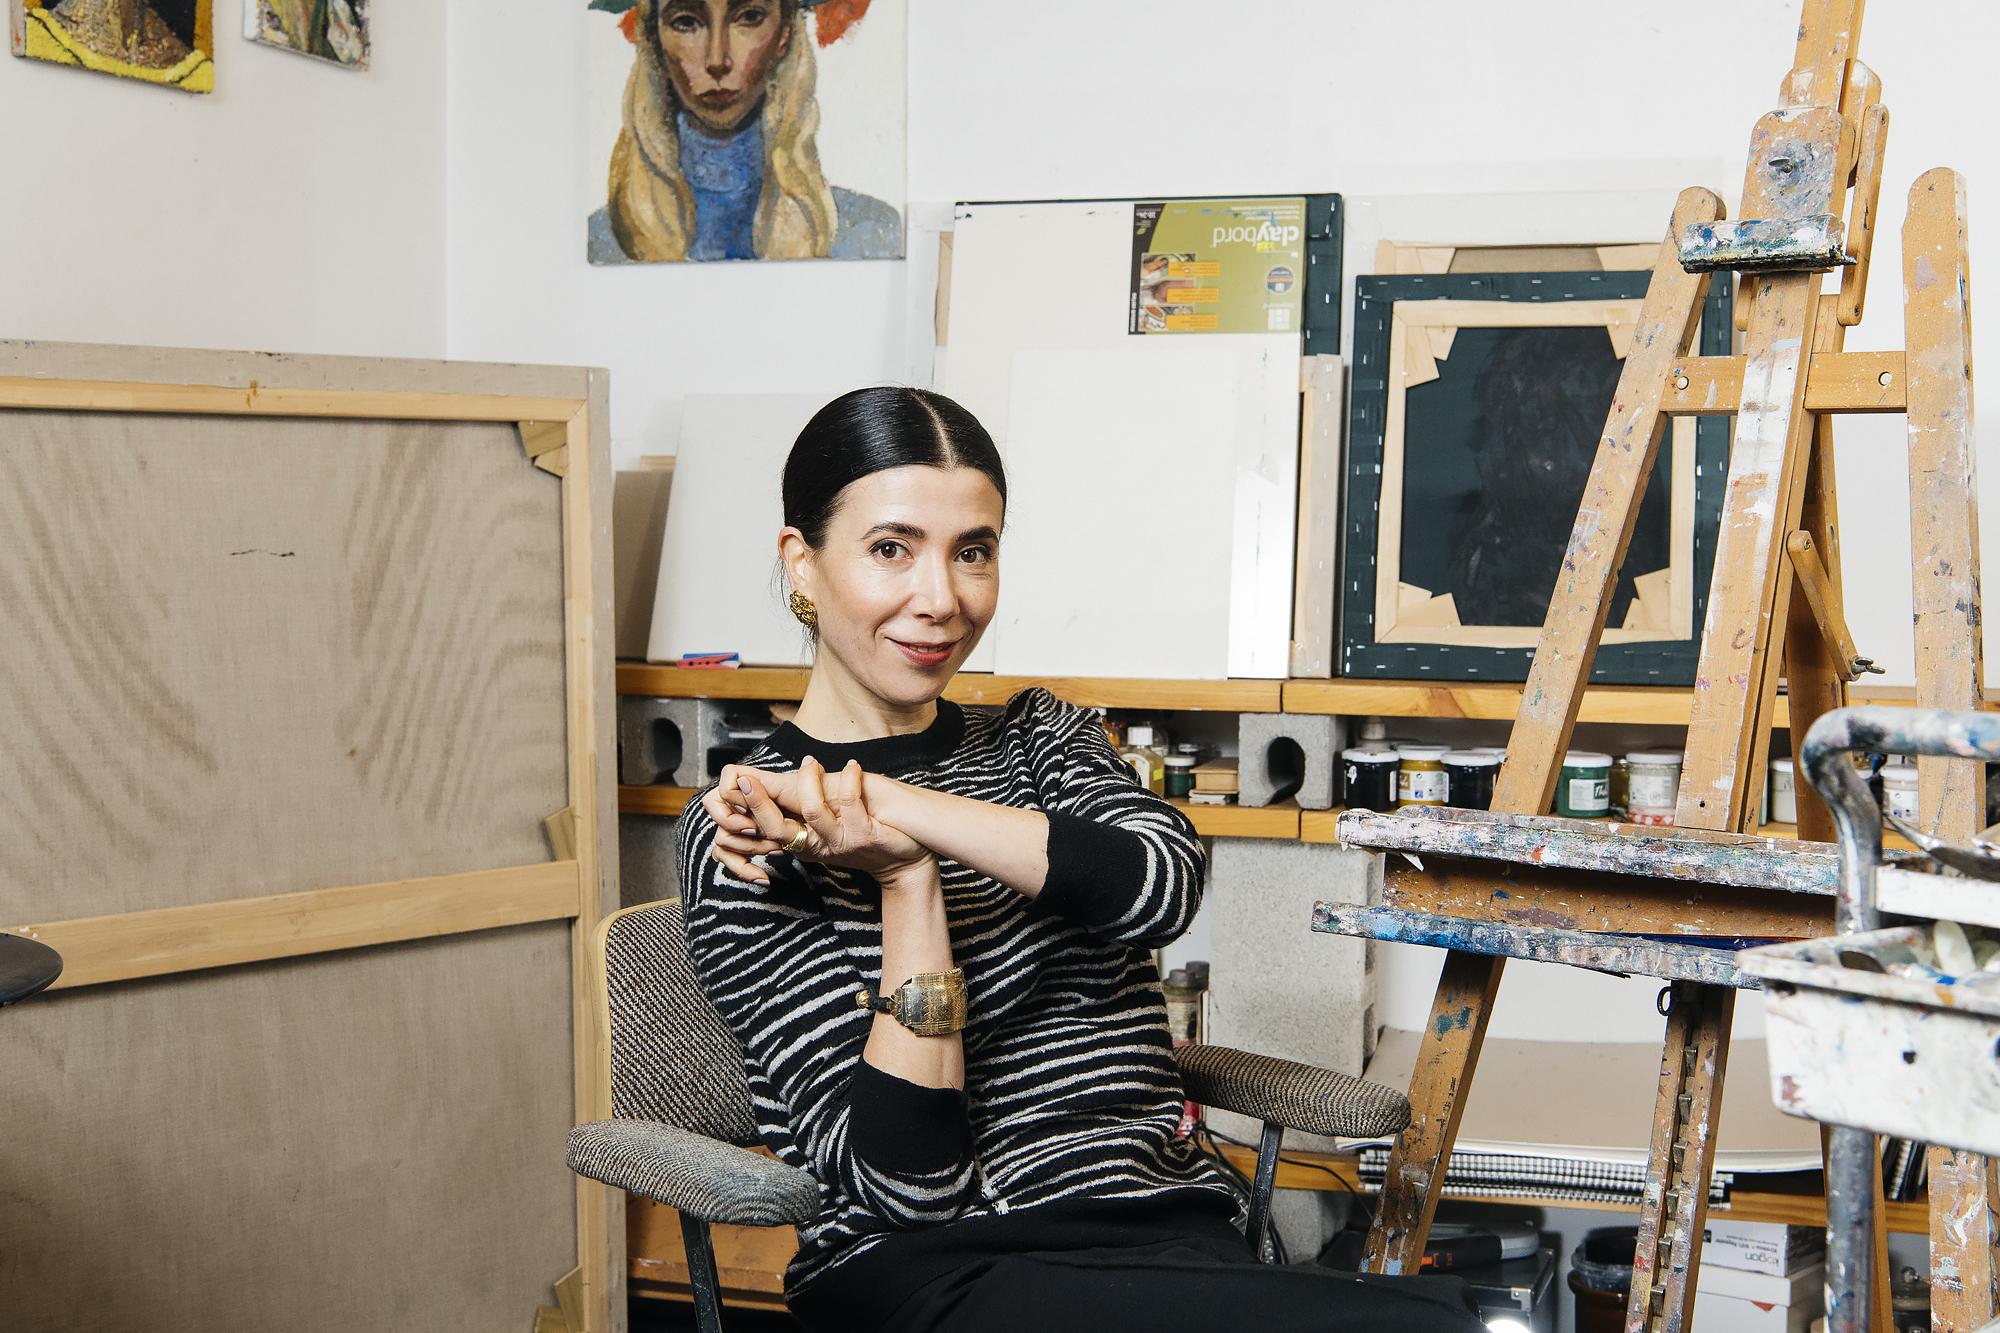 2018 Archibald Prize Winner, Yvette Coppersmith